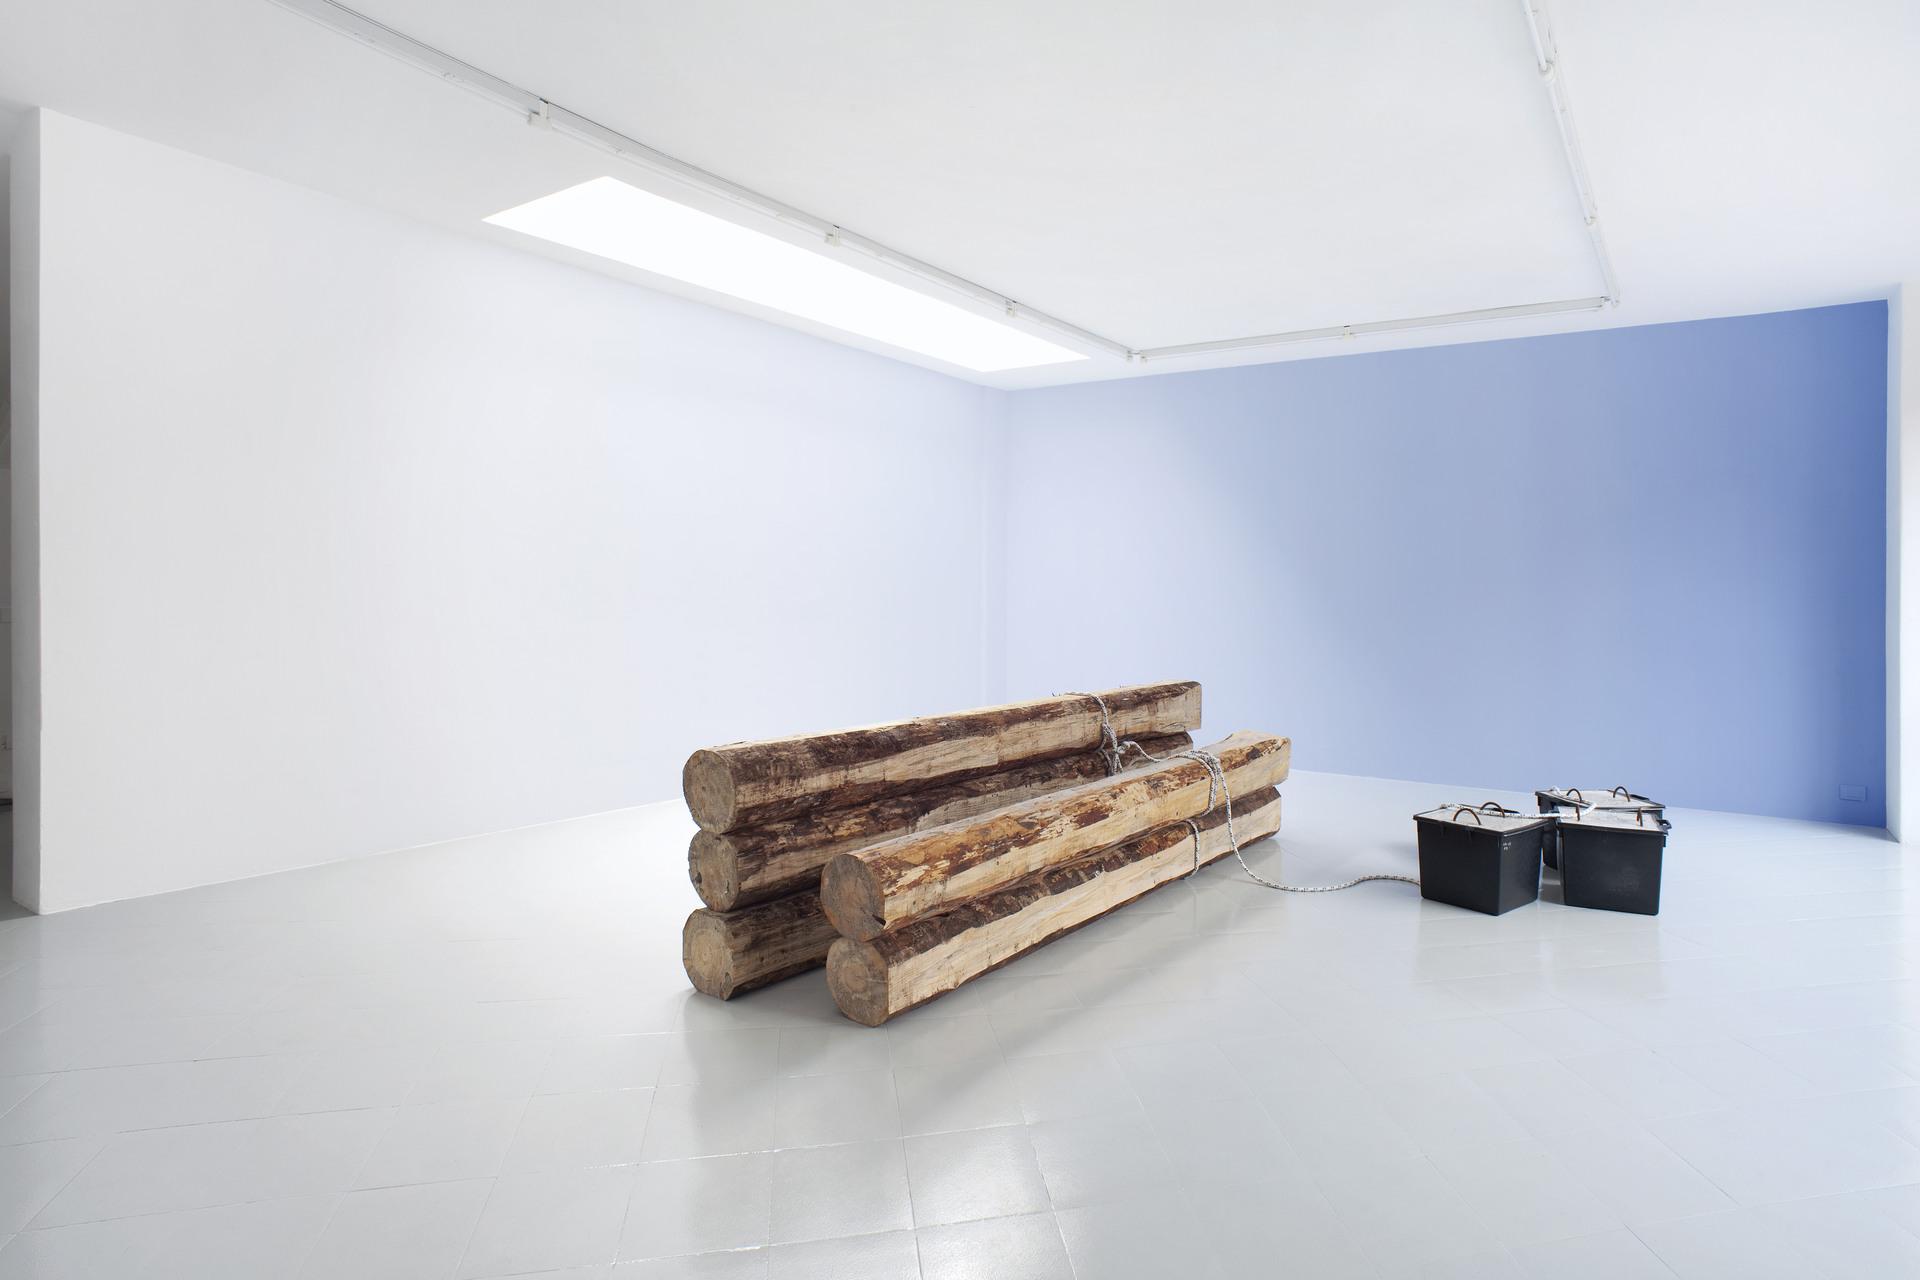 1 - Karsten Fo¦êdinger, Pieter Vermeersch, Installation View, 2015, Cabinet, Milano - Courtesy Artists and Cabinet, Milan, Photo Filippo Armellin